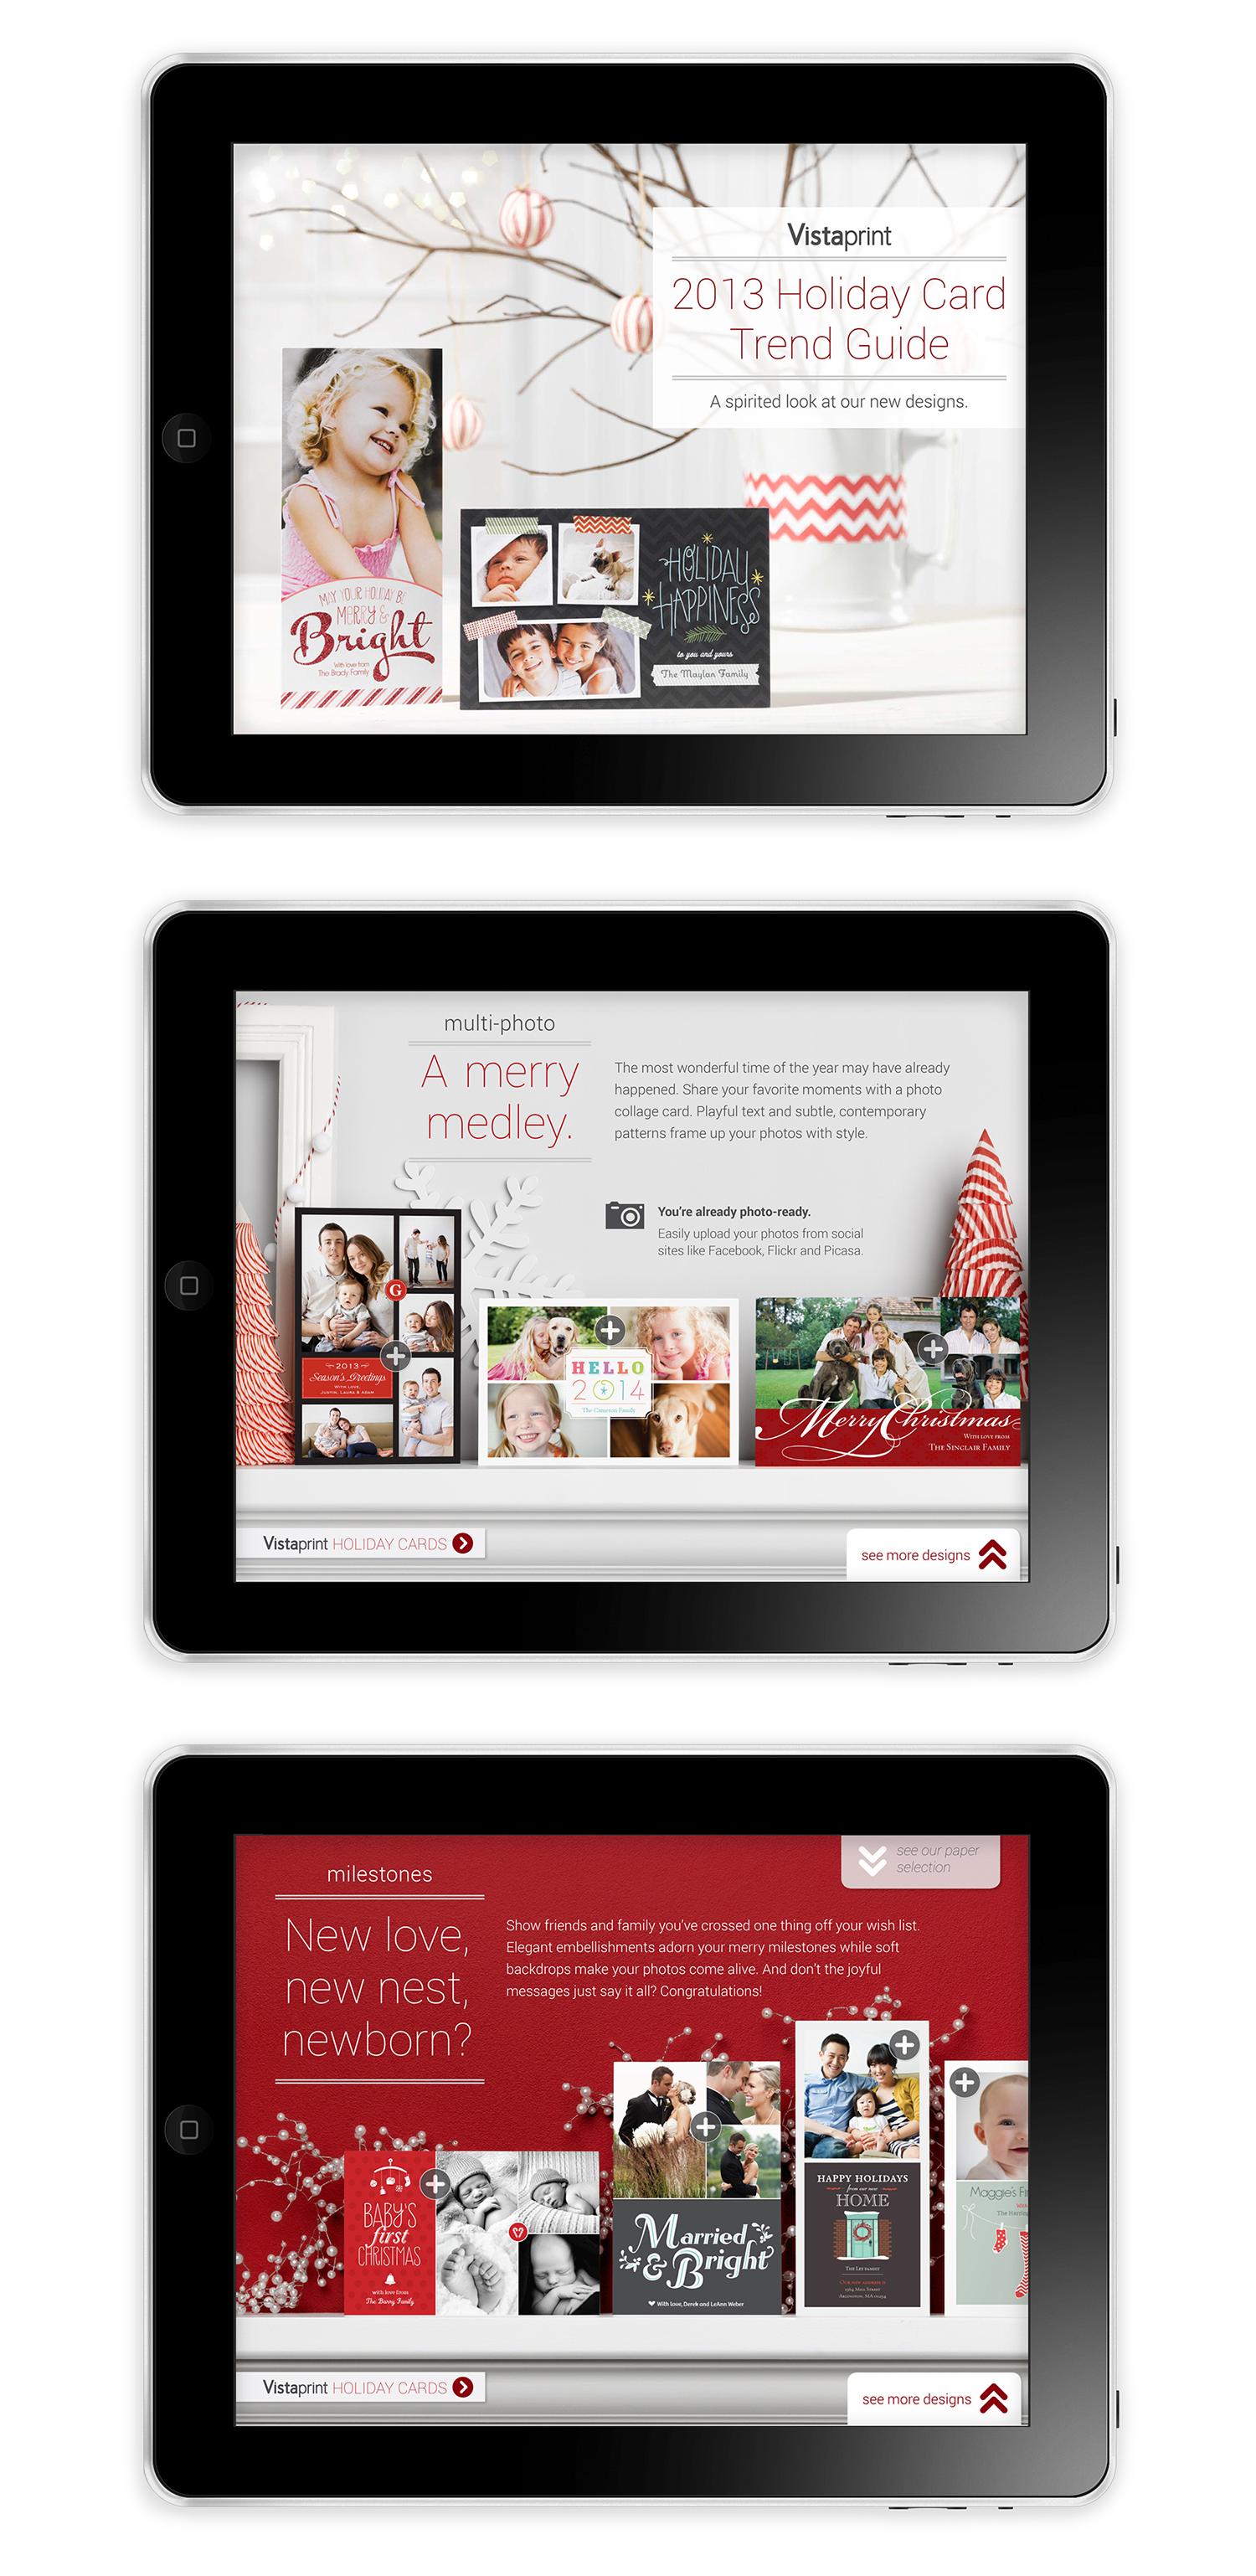 Holiday App | Developer: Luis Mendes, Art Director: Walter Waller, Designer: Lori Lepine, Copywriter: Jen Gibson